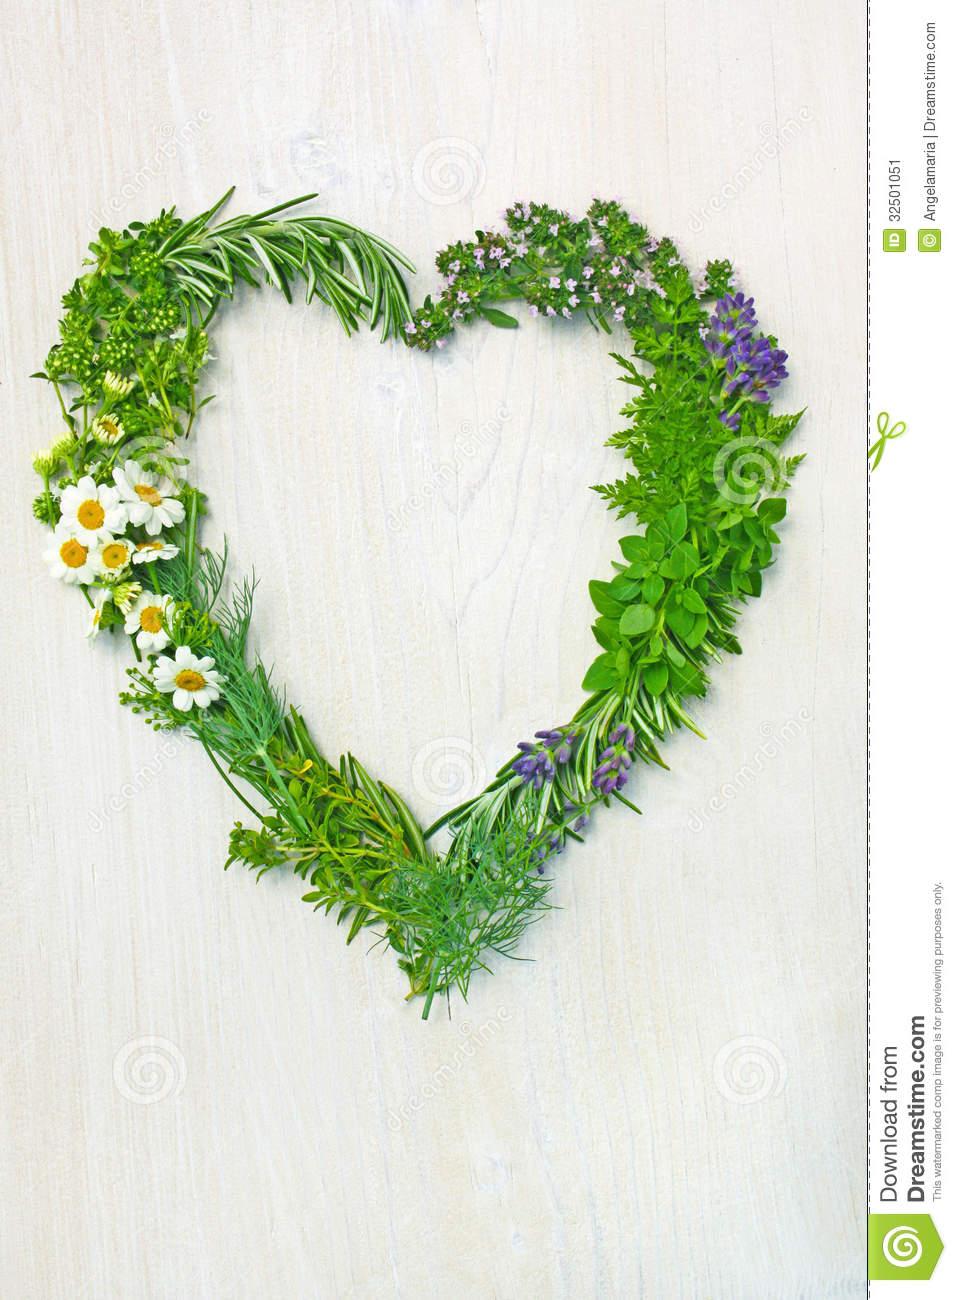 fresh-herbs-shape-love-heart-different-g